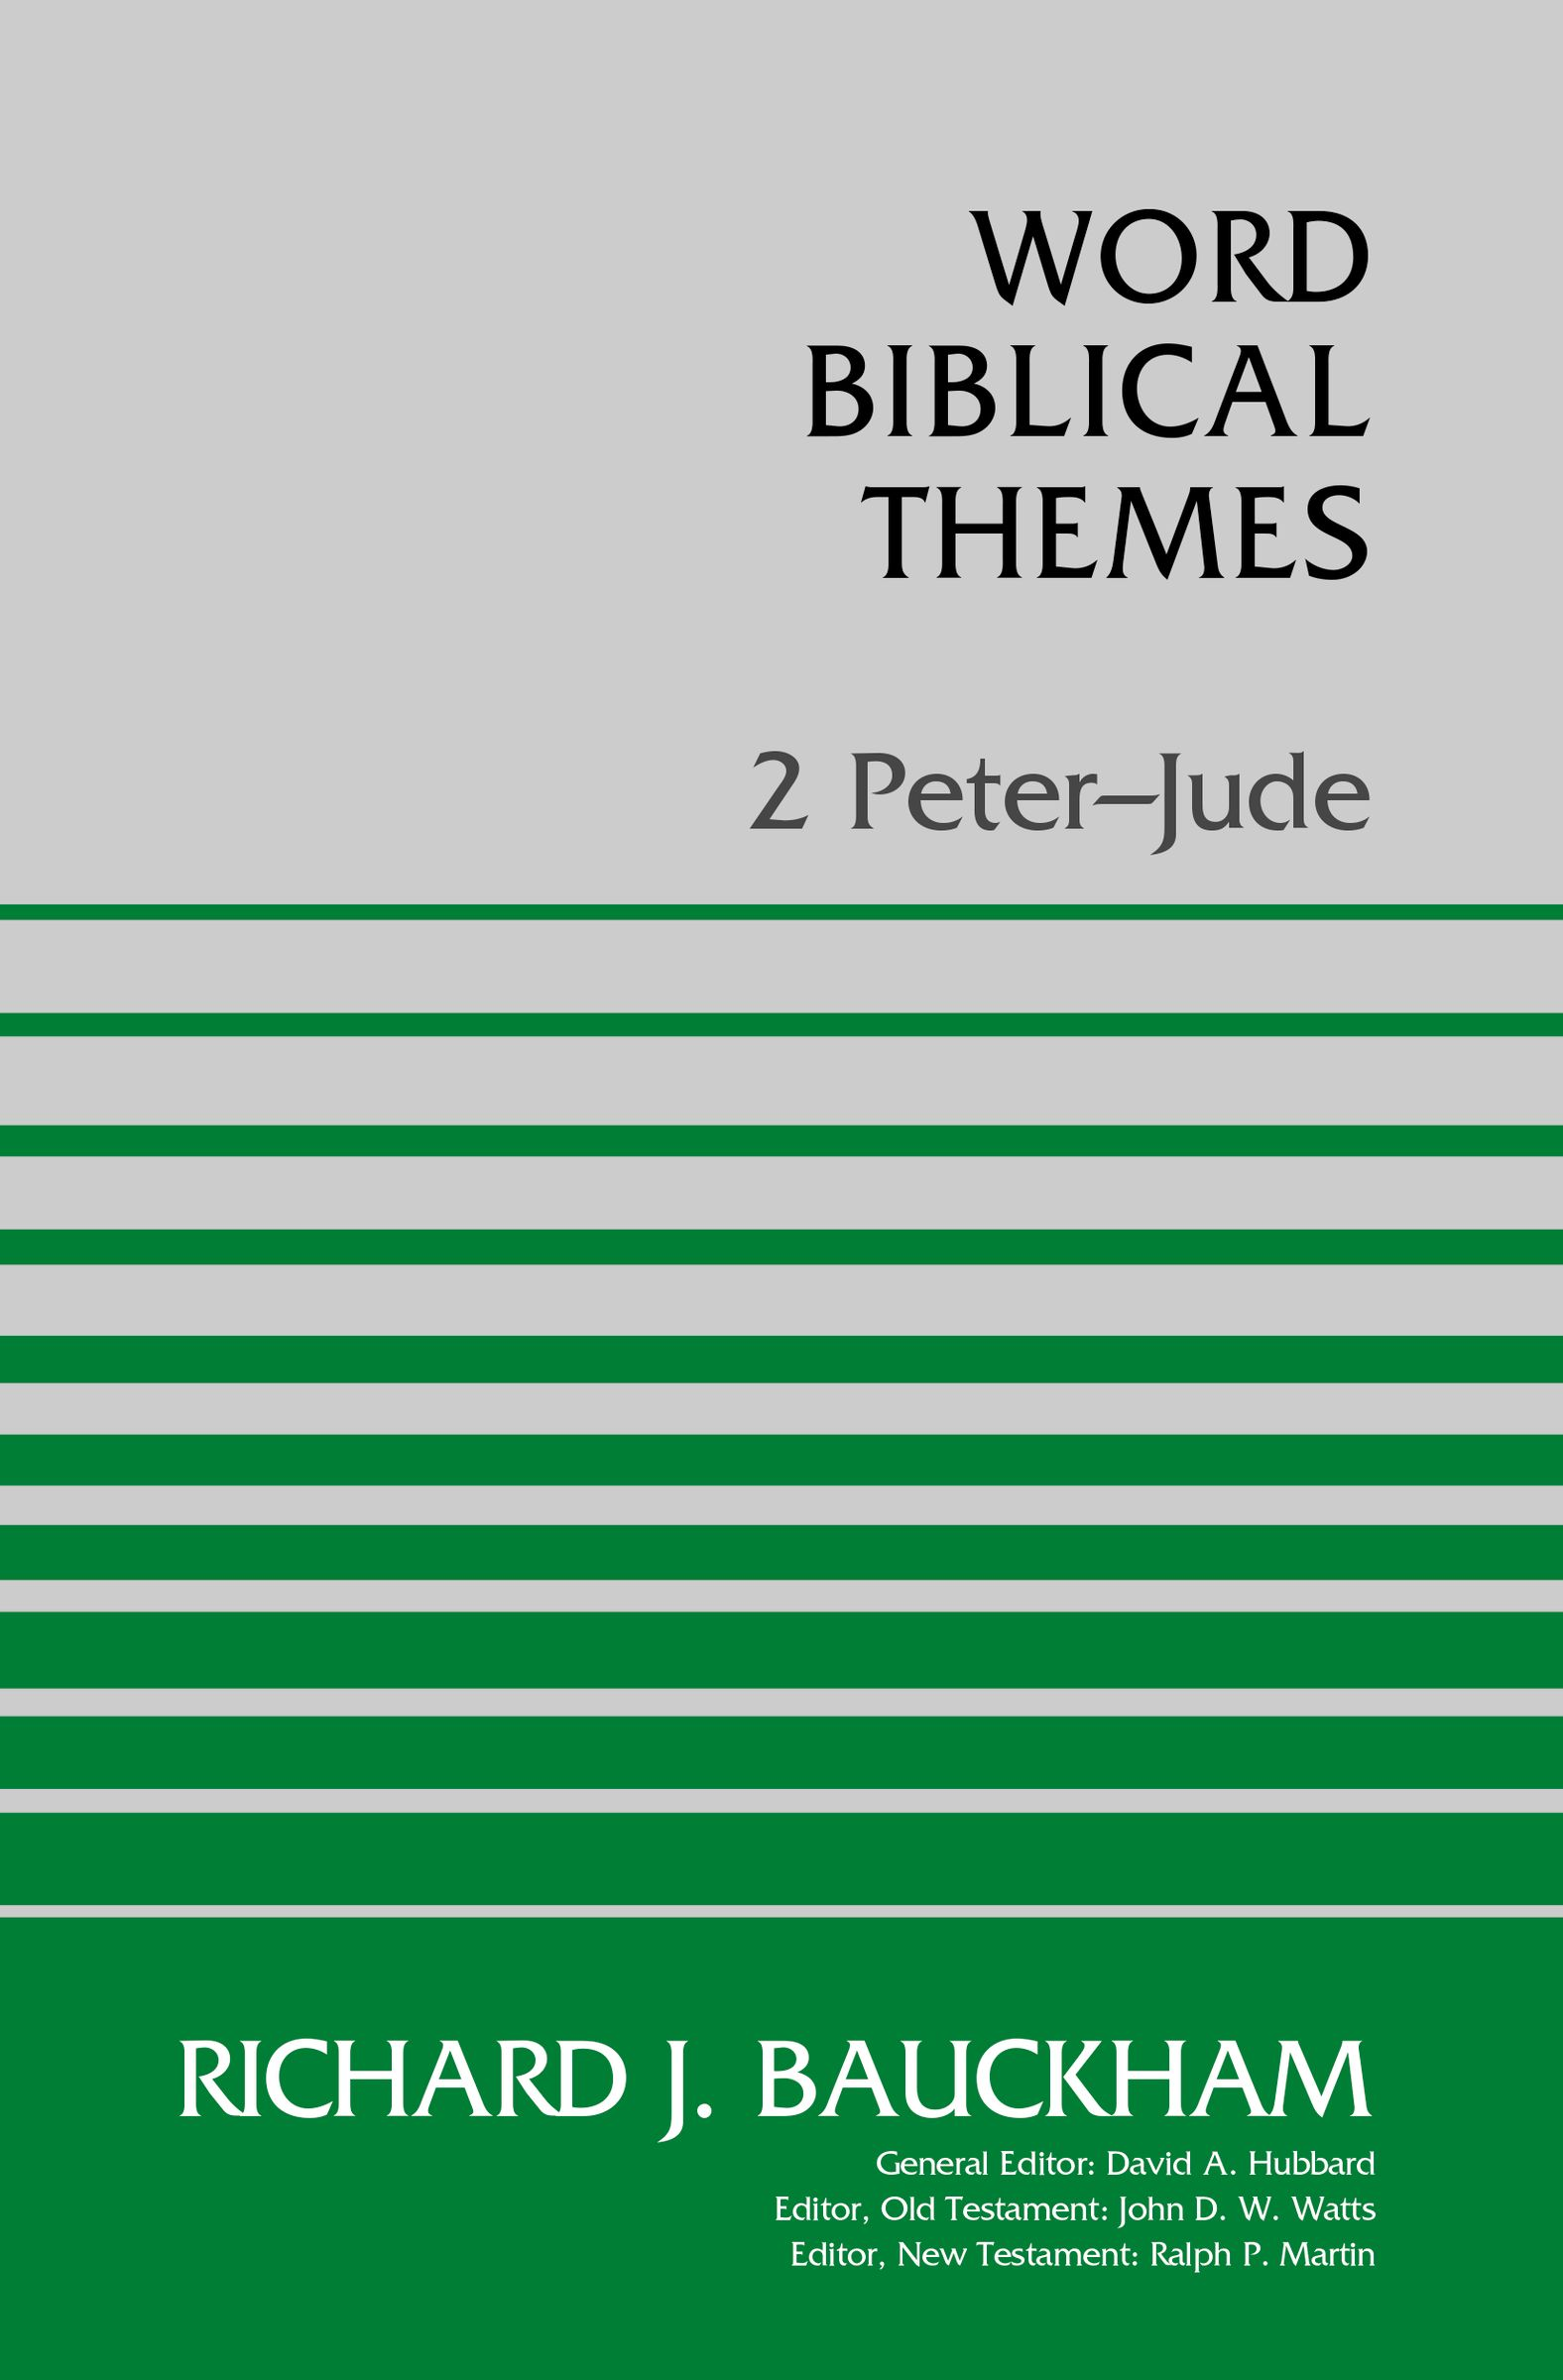 2 Peter-Jude